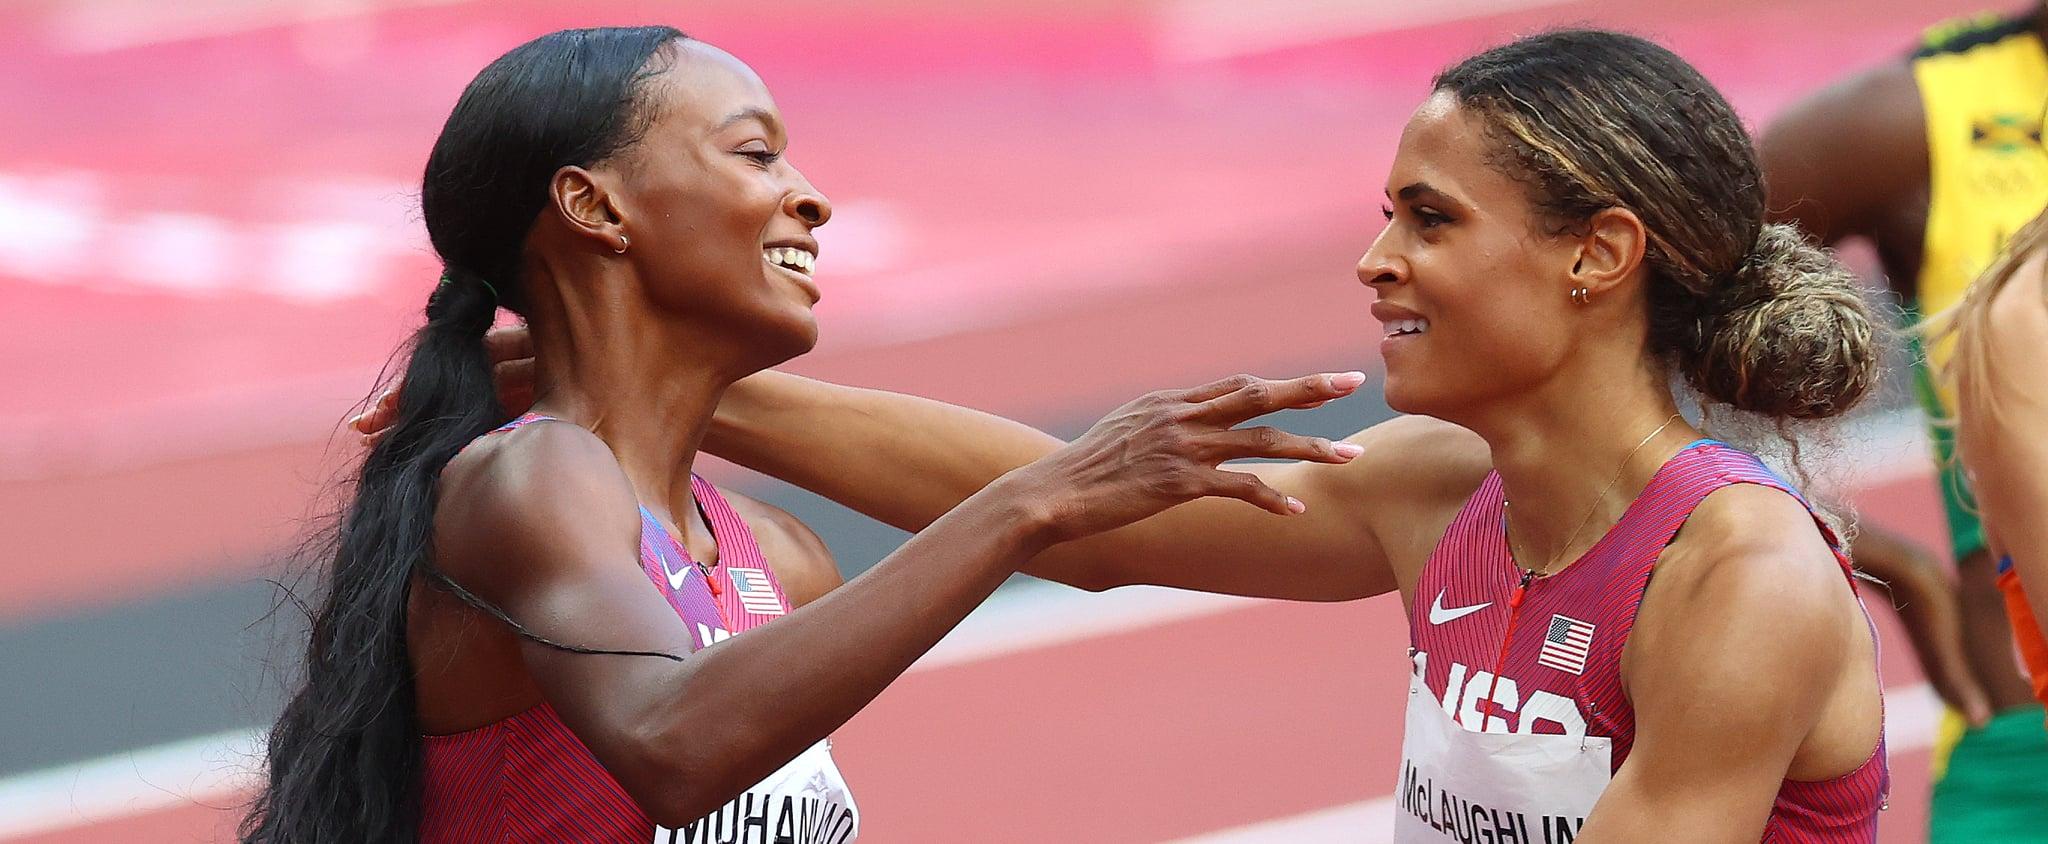 Sydney McLaughlin Wins 400m Hurdles at 2021 Olympics